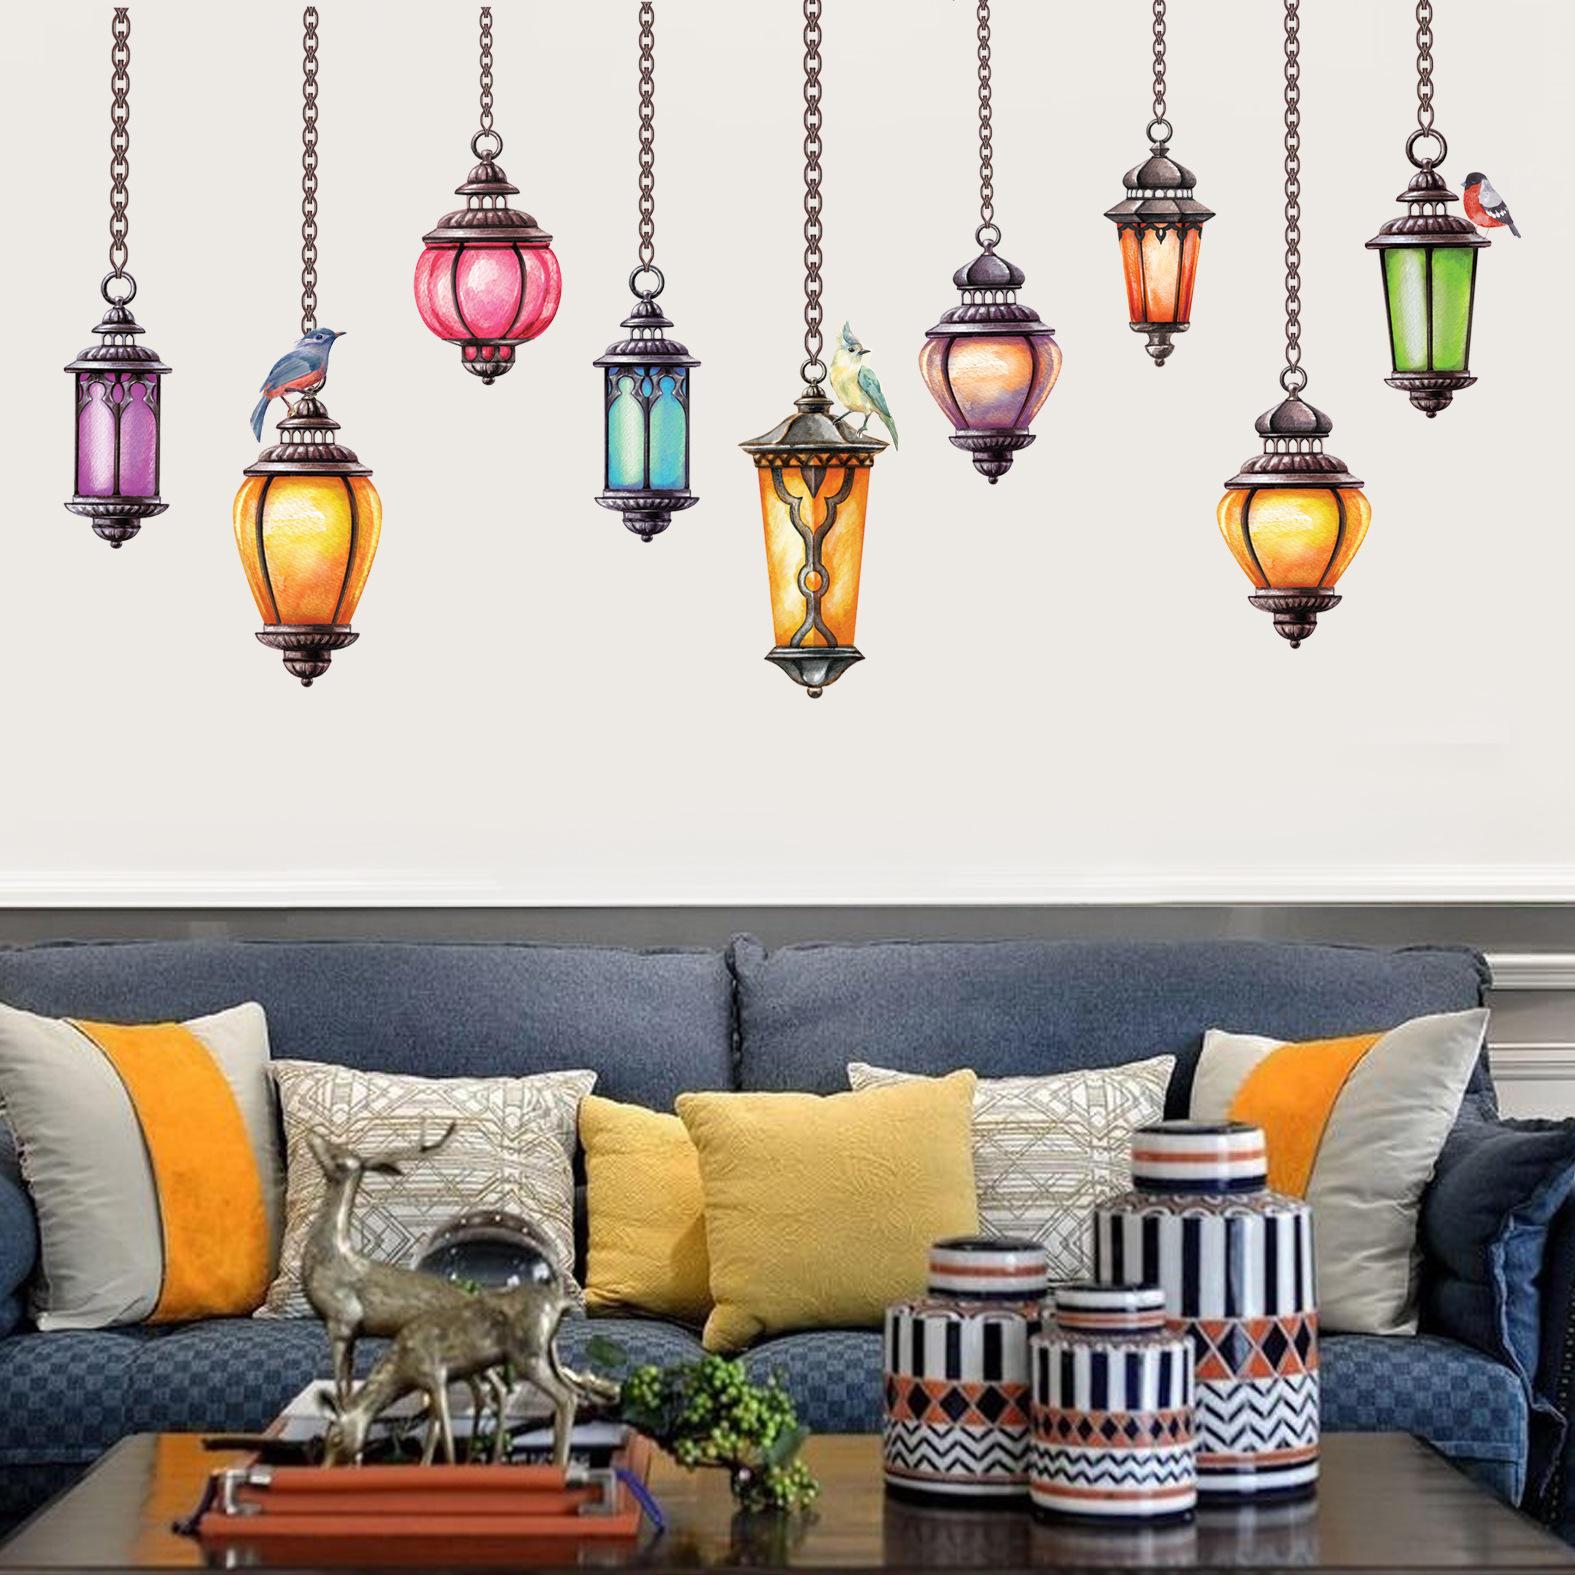 Miico 크리 에이 티브 다채로운 Exotica 천장 램프 PVC 이동식 홈 룸 장식 벽 문 장식 스티커